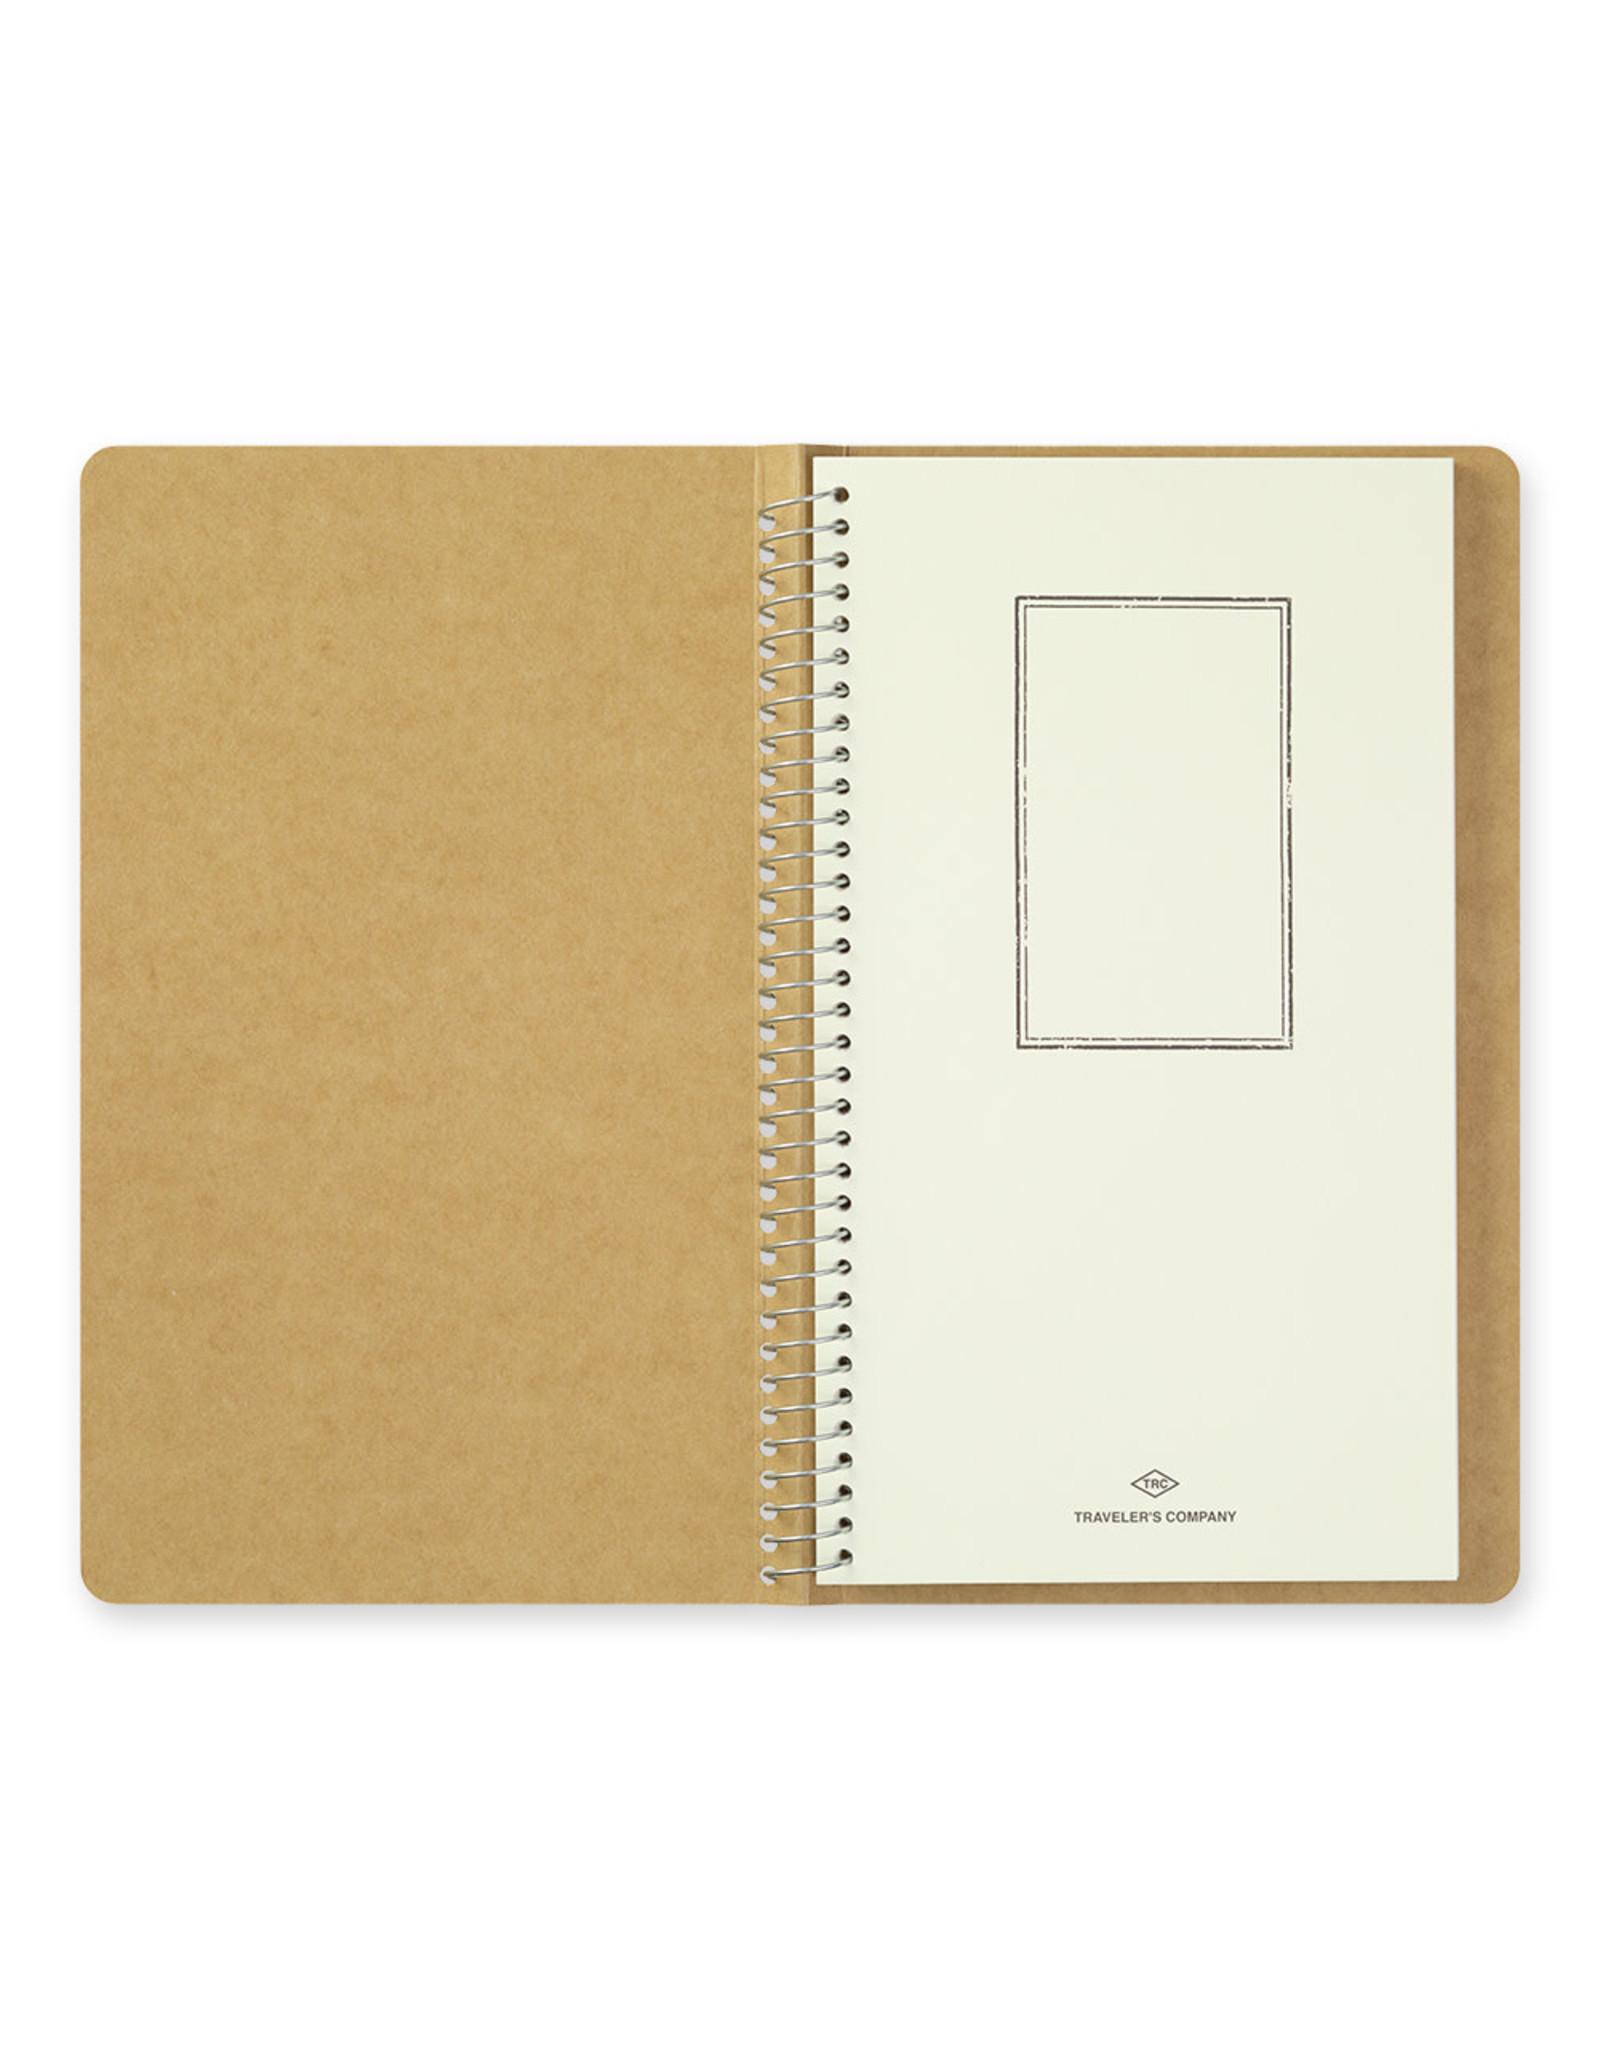 Designphil Inc. DESIGNPHIL TRC SPIRAL RING NOTEBOOK  WATERCOLOR PAPER